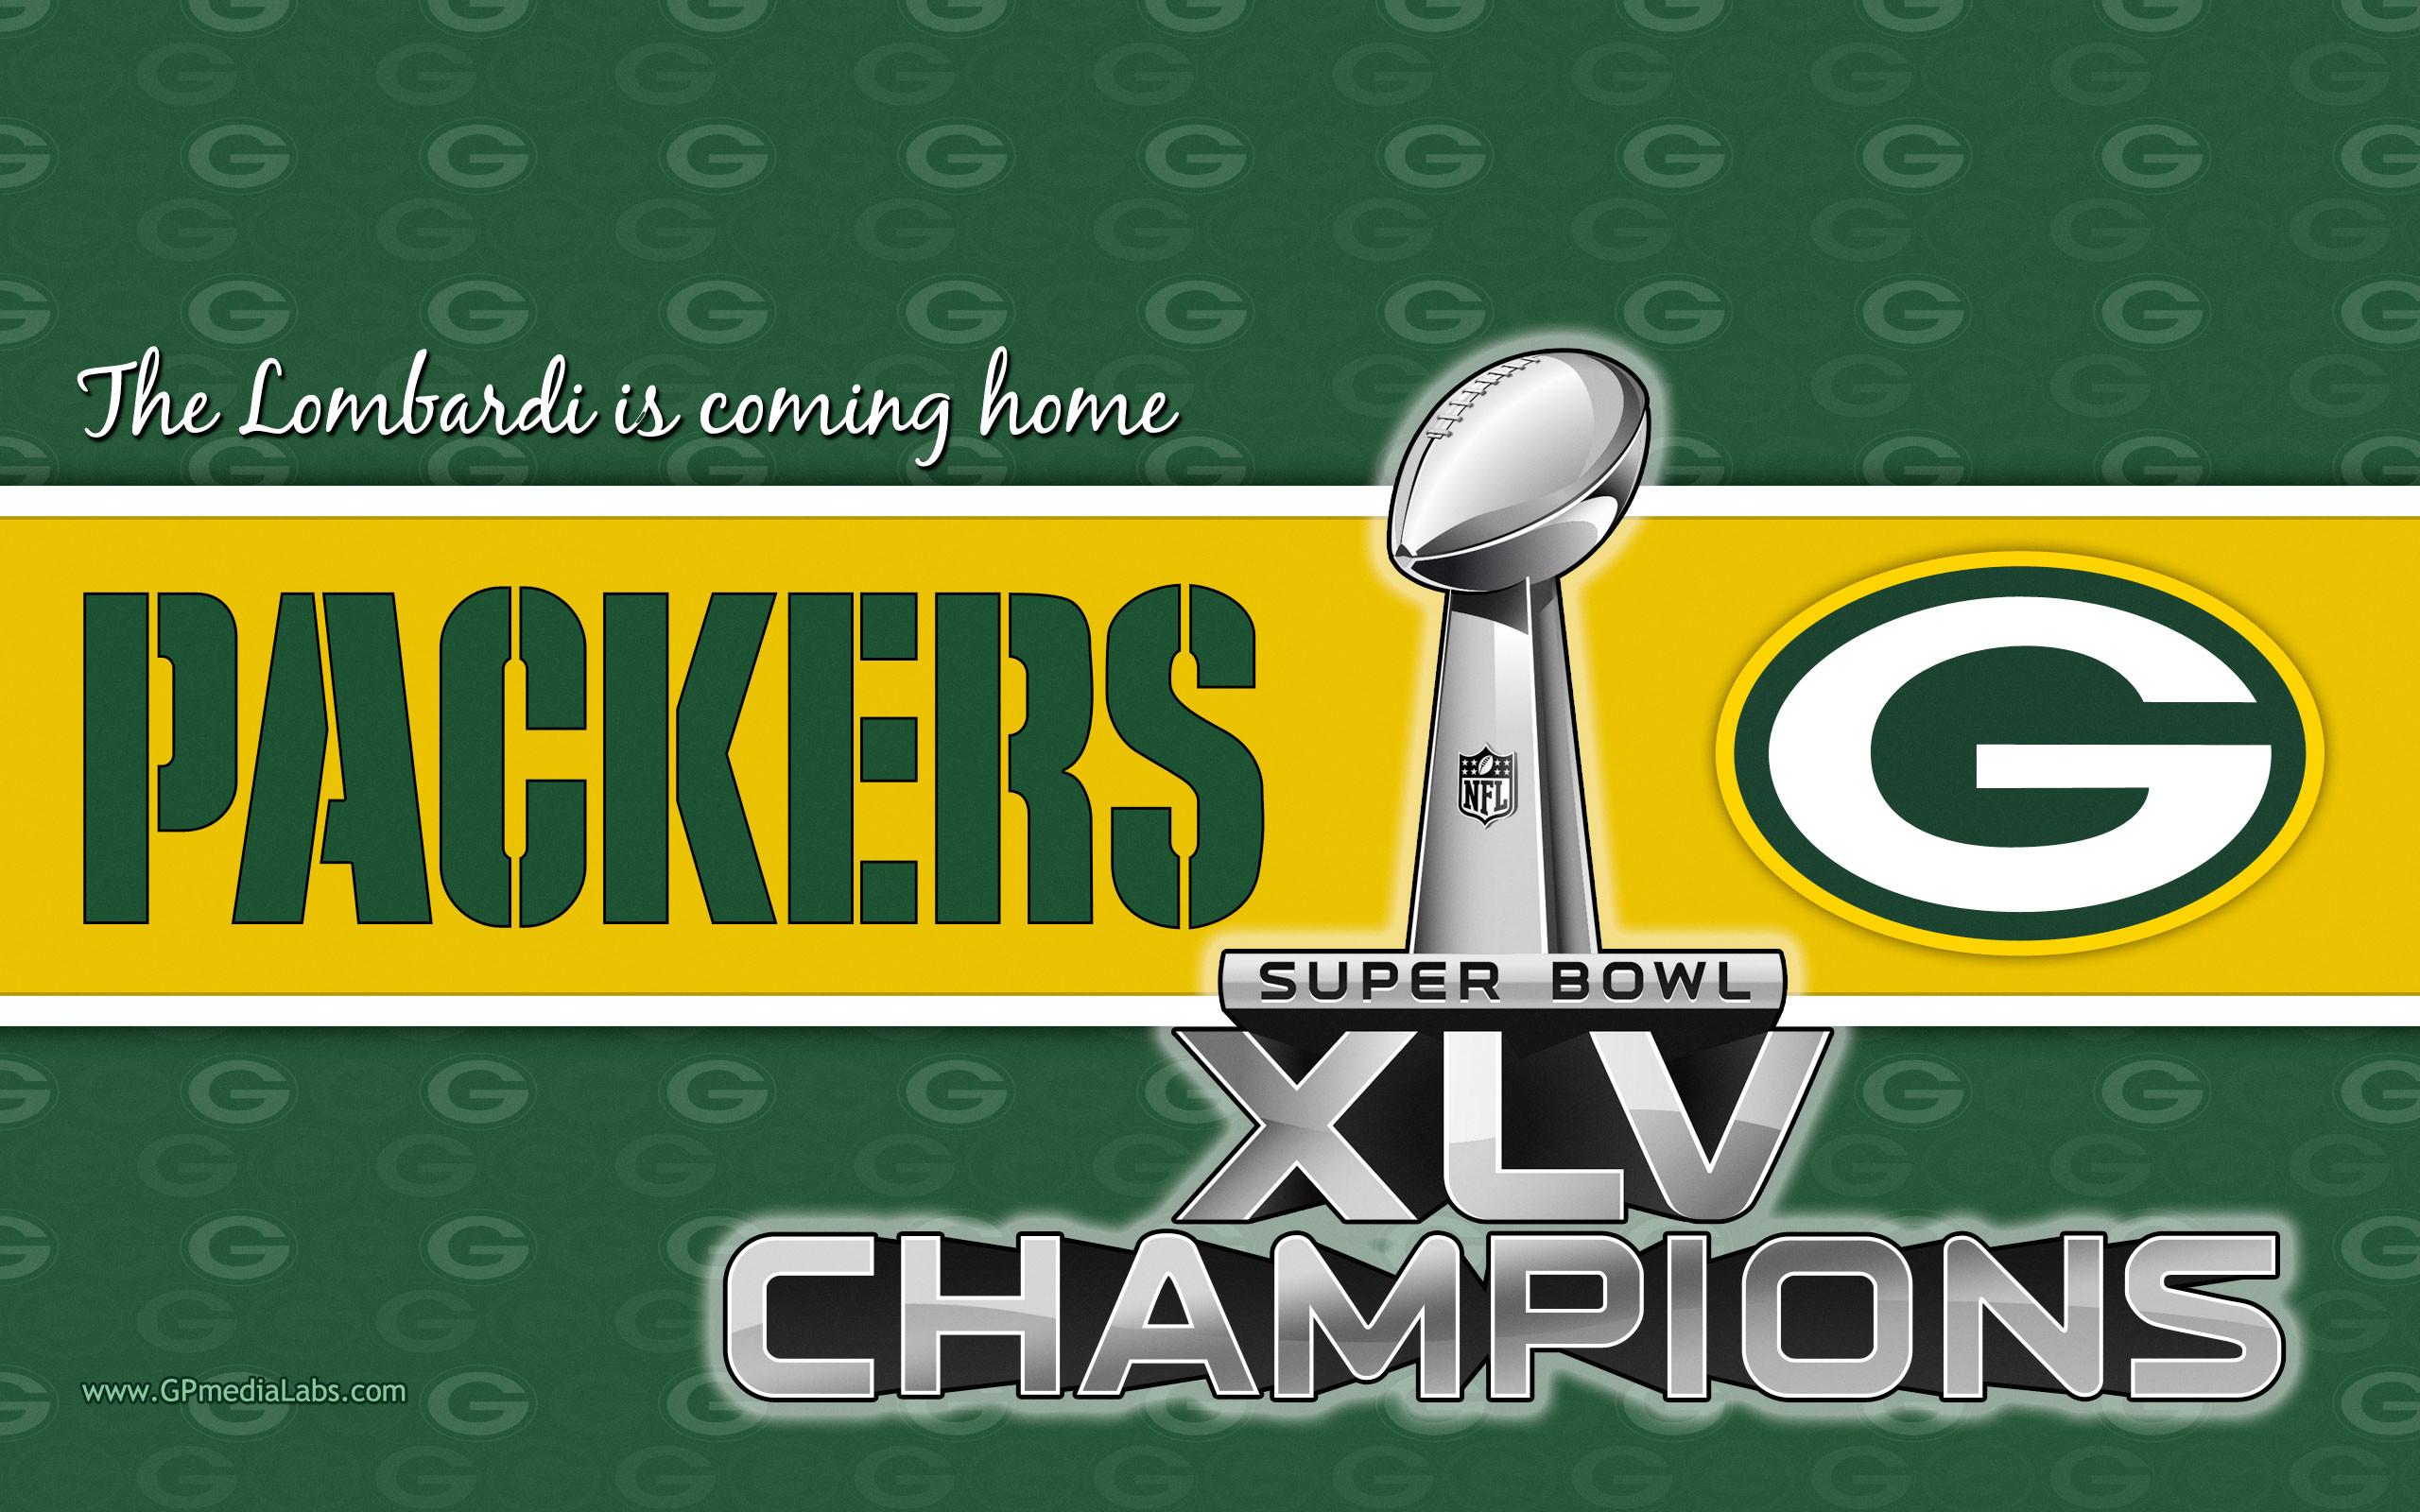 Green Bay Packers NFL 2011 Champions Widescreen Wallpaper